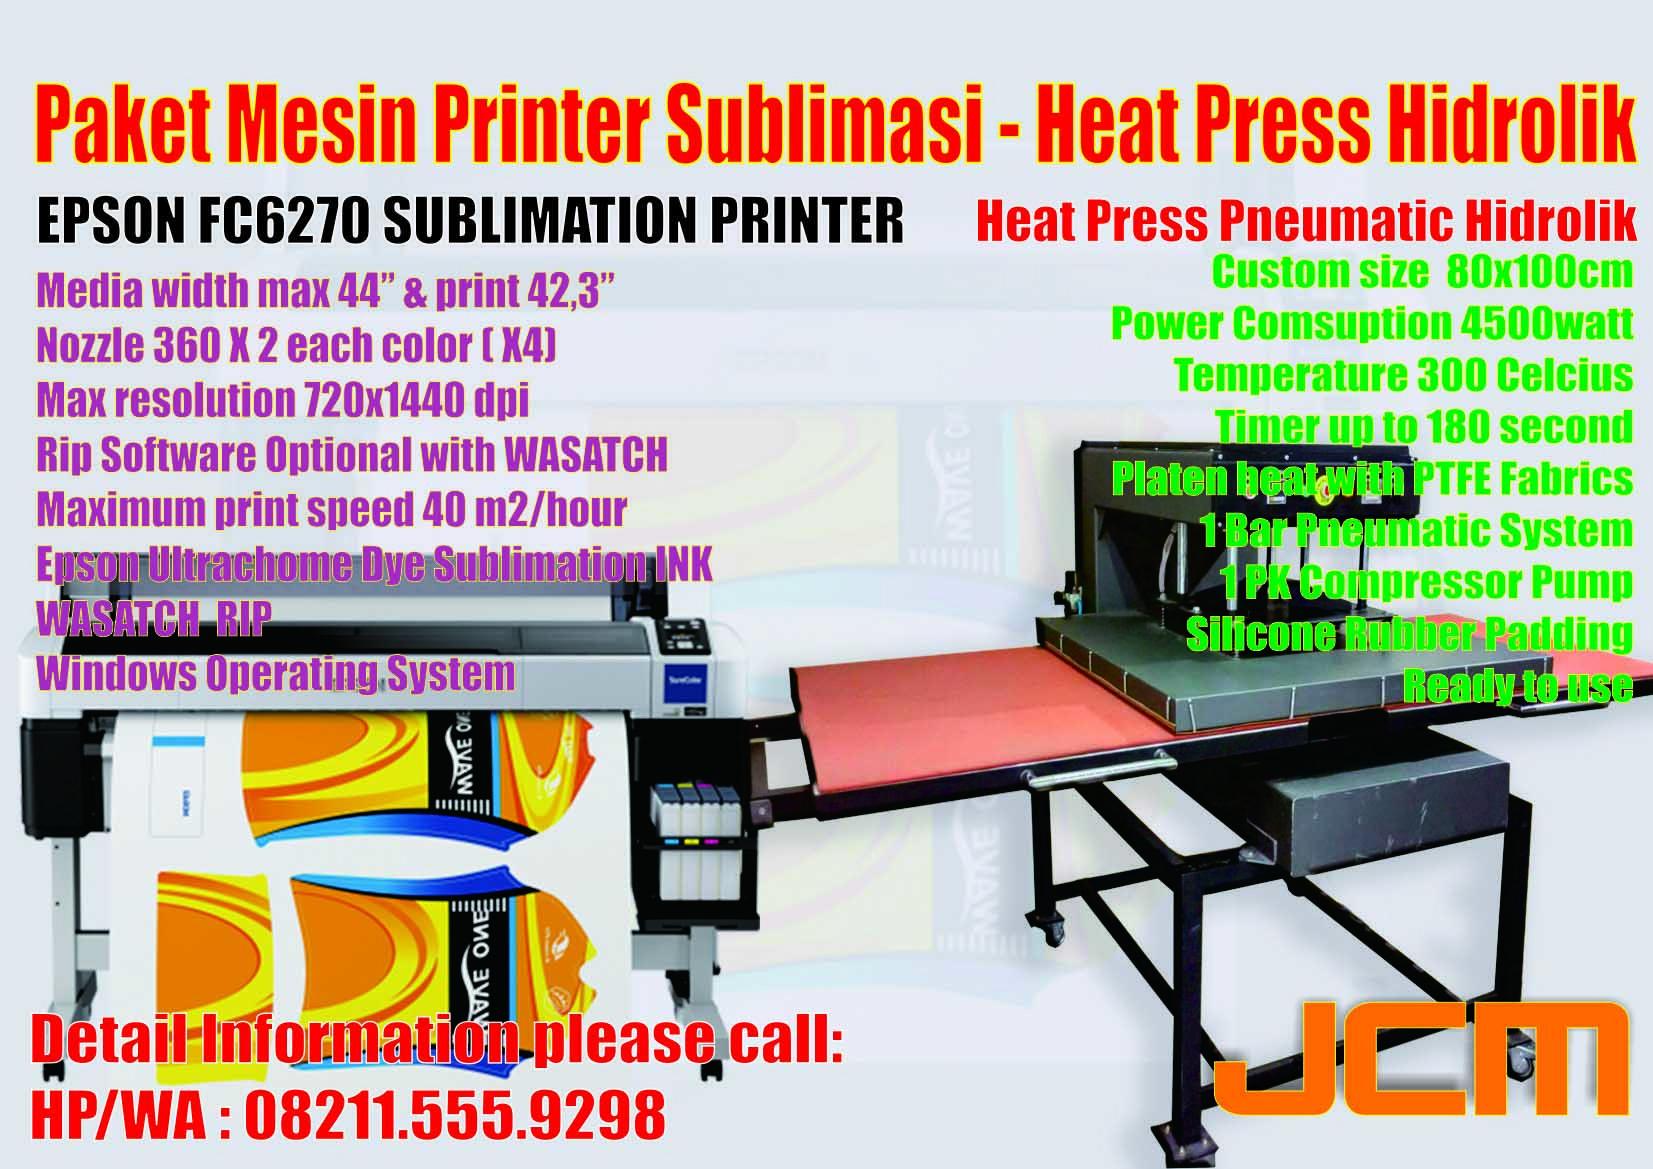 Jual Mesin Printer Harga Sublim Sublime Sublimasi Epson Fc6270 Press Pin Mutoh Rj 900x